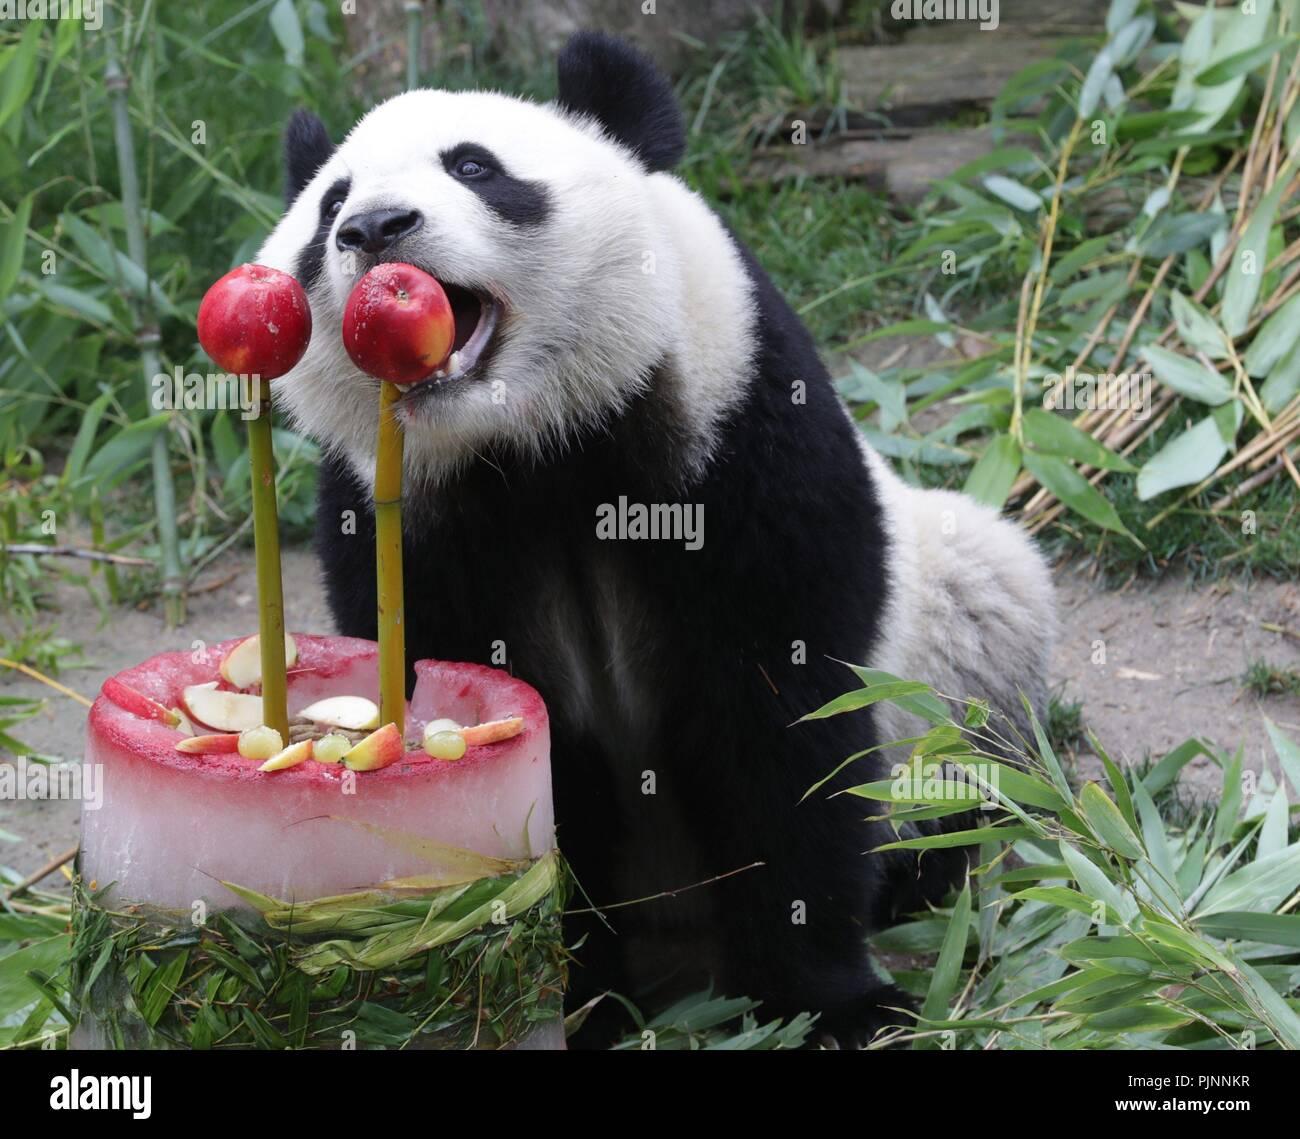 Panda Birthday Zoo Stock Photos Panda Birthday Zoo Stock Images